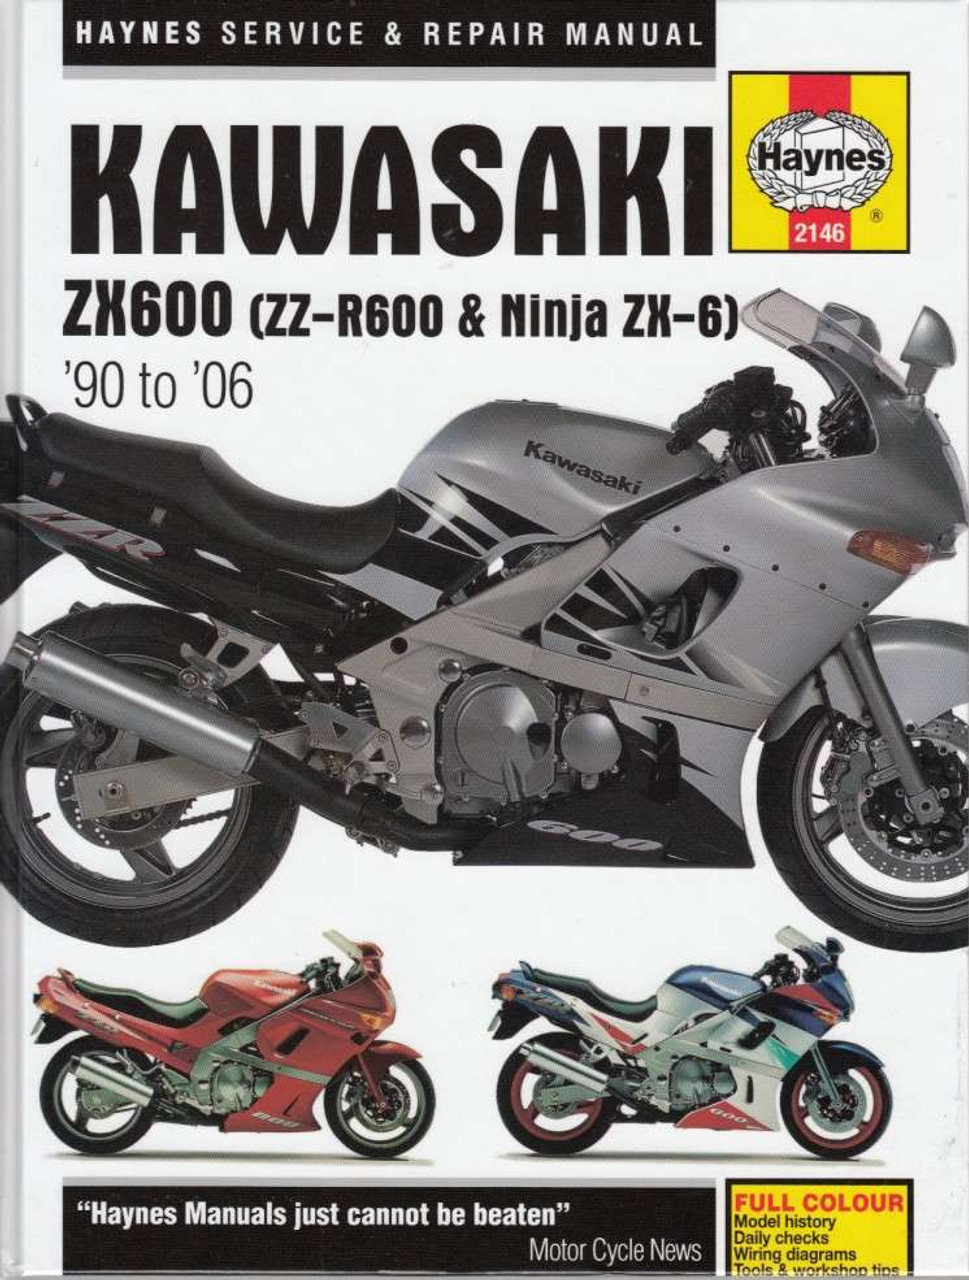 Miraculous Kawasaki Zx600 Zz R600 Ninja Zx 6 1990 2006 Workshop Manual Wiring 101 Cranwise Assnl